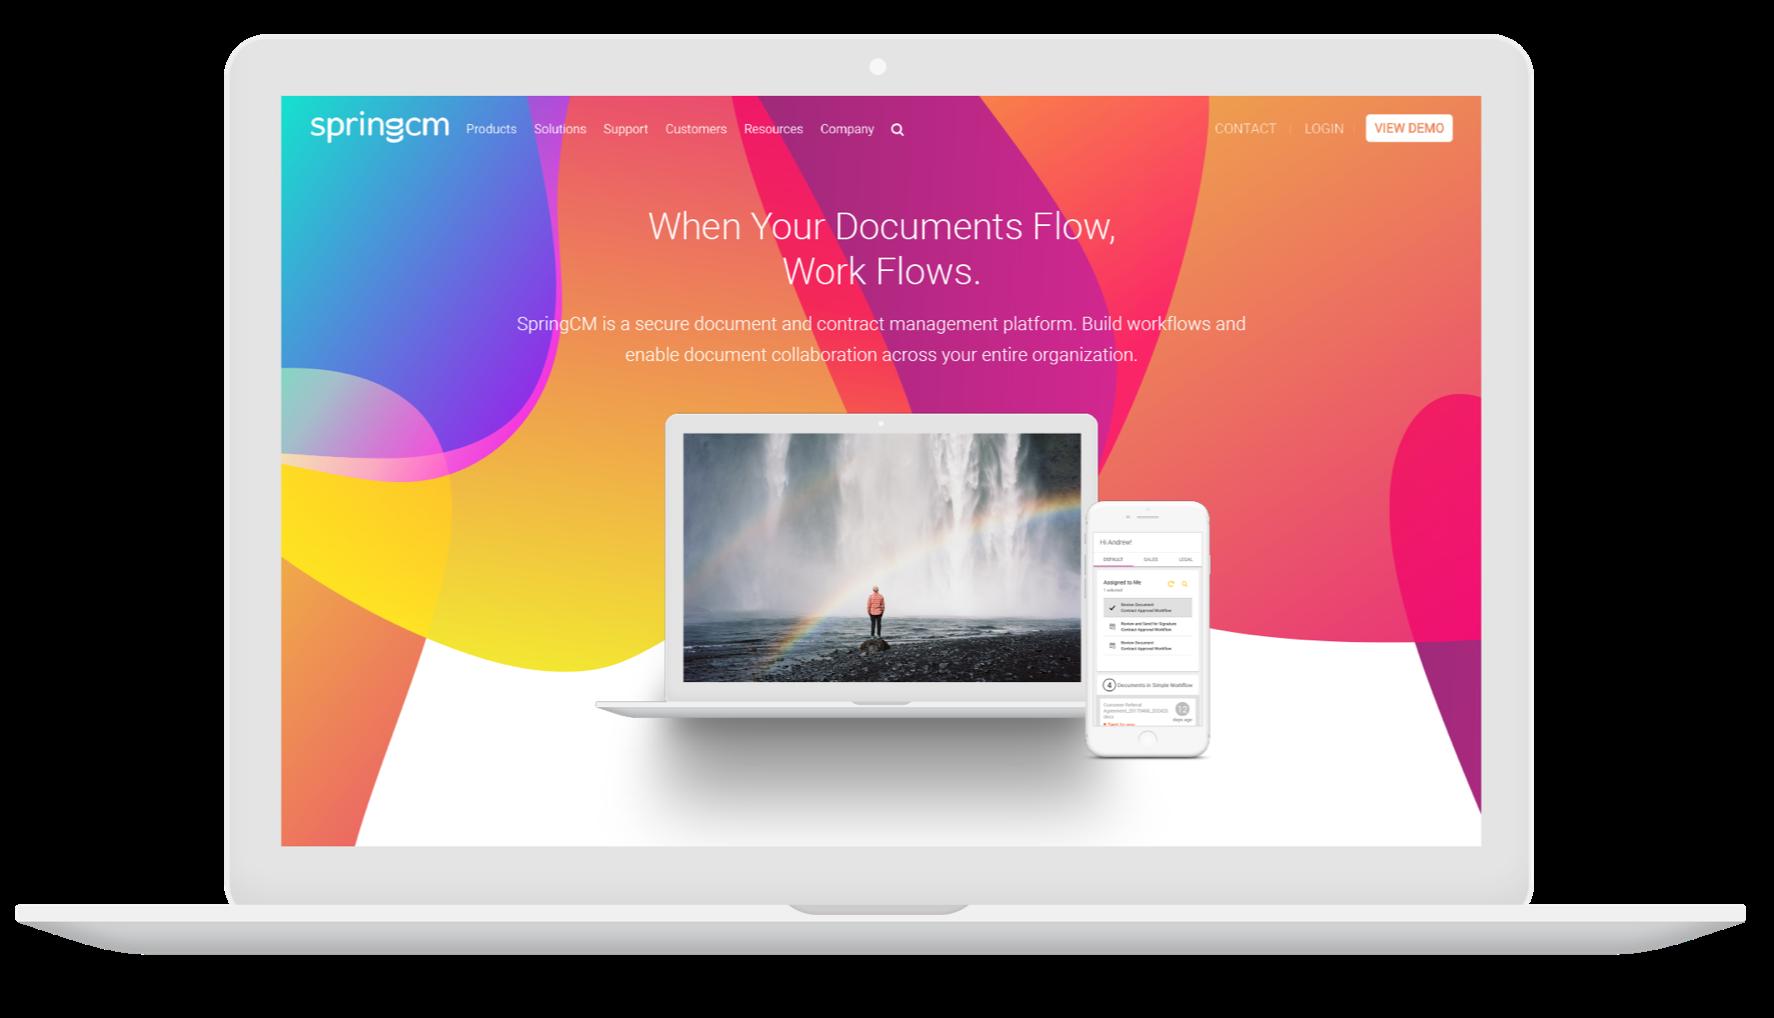 SpringCM New Website Design